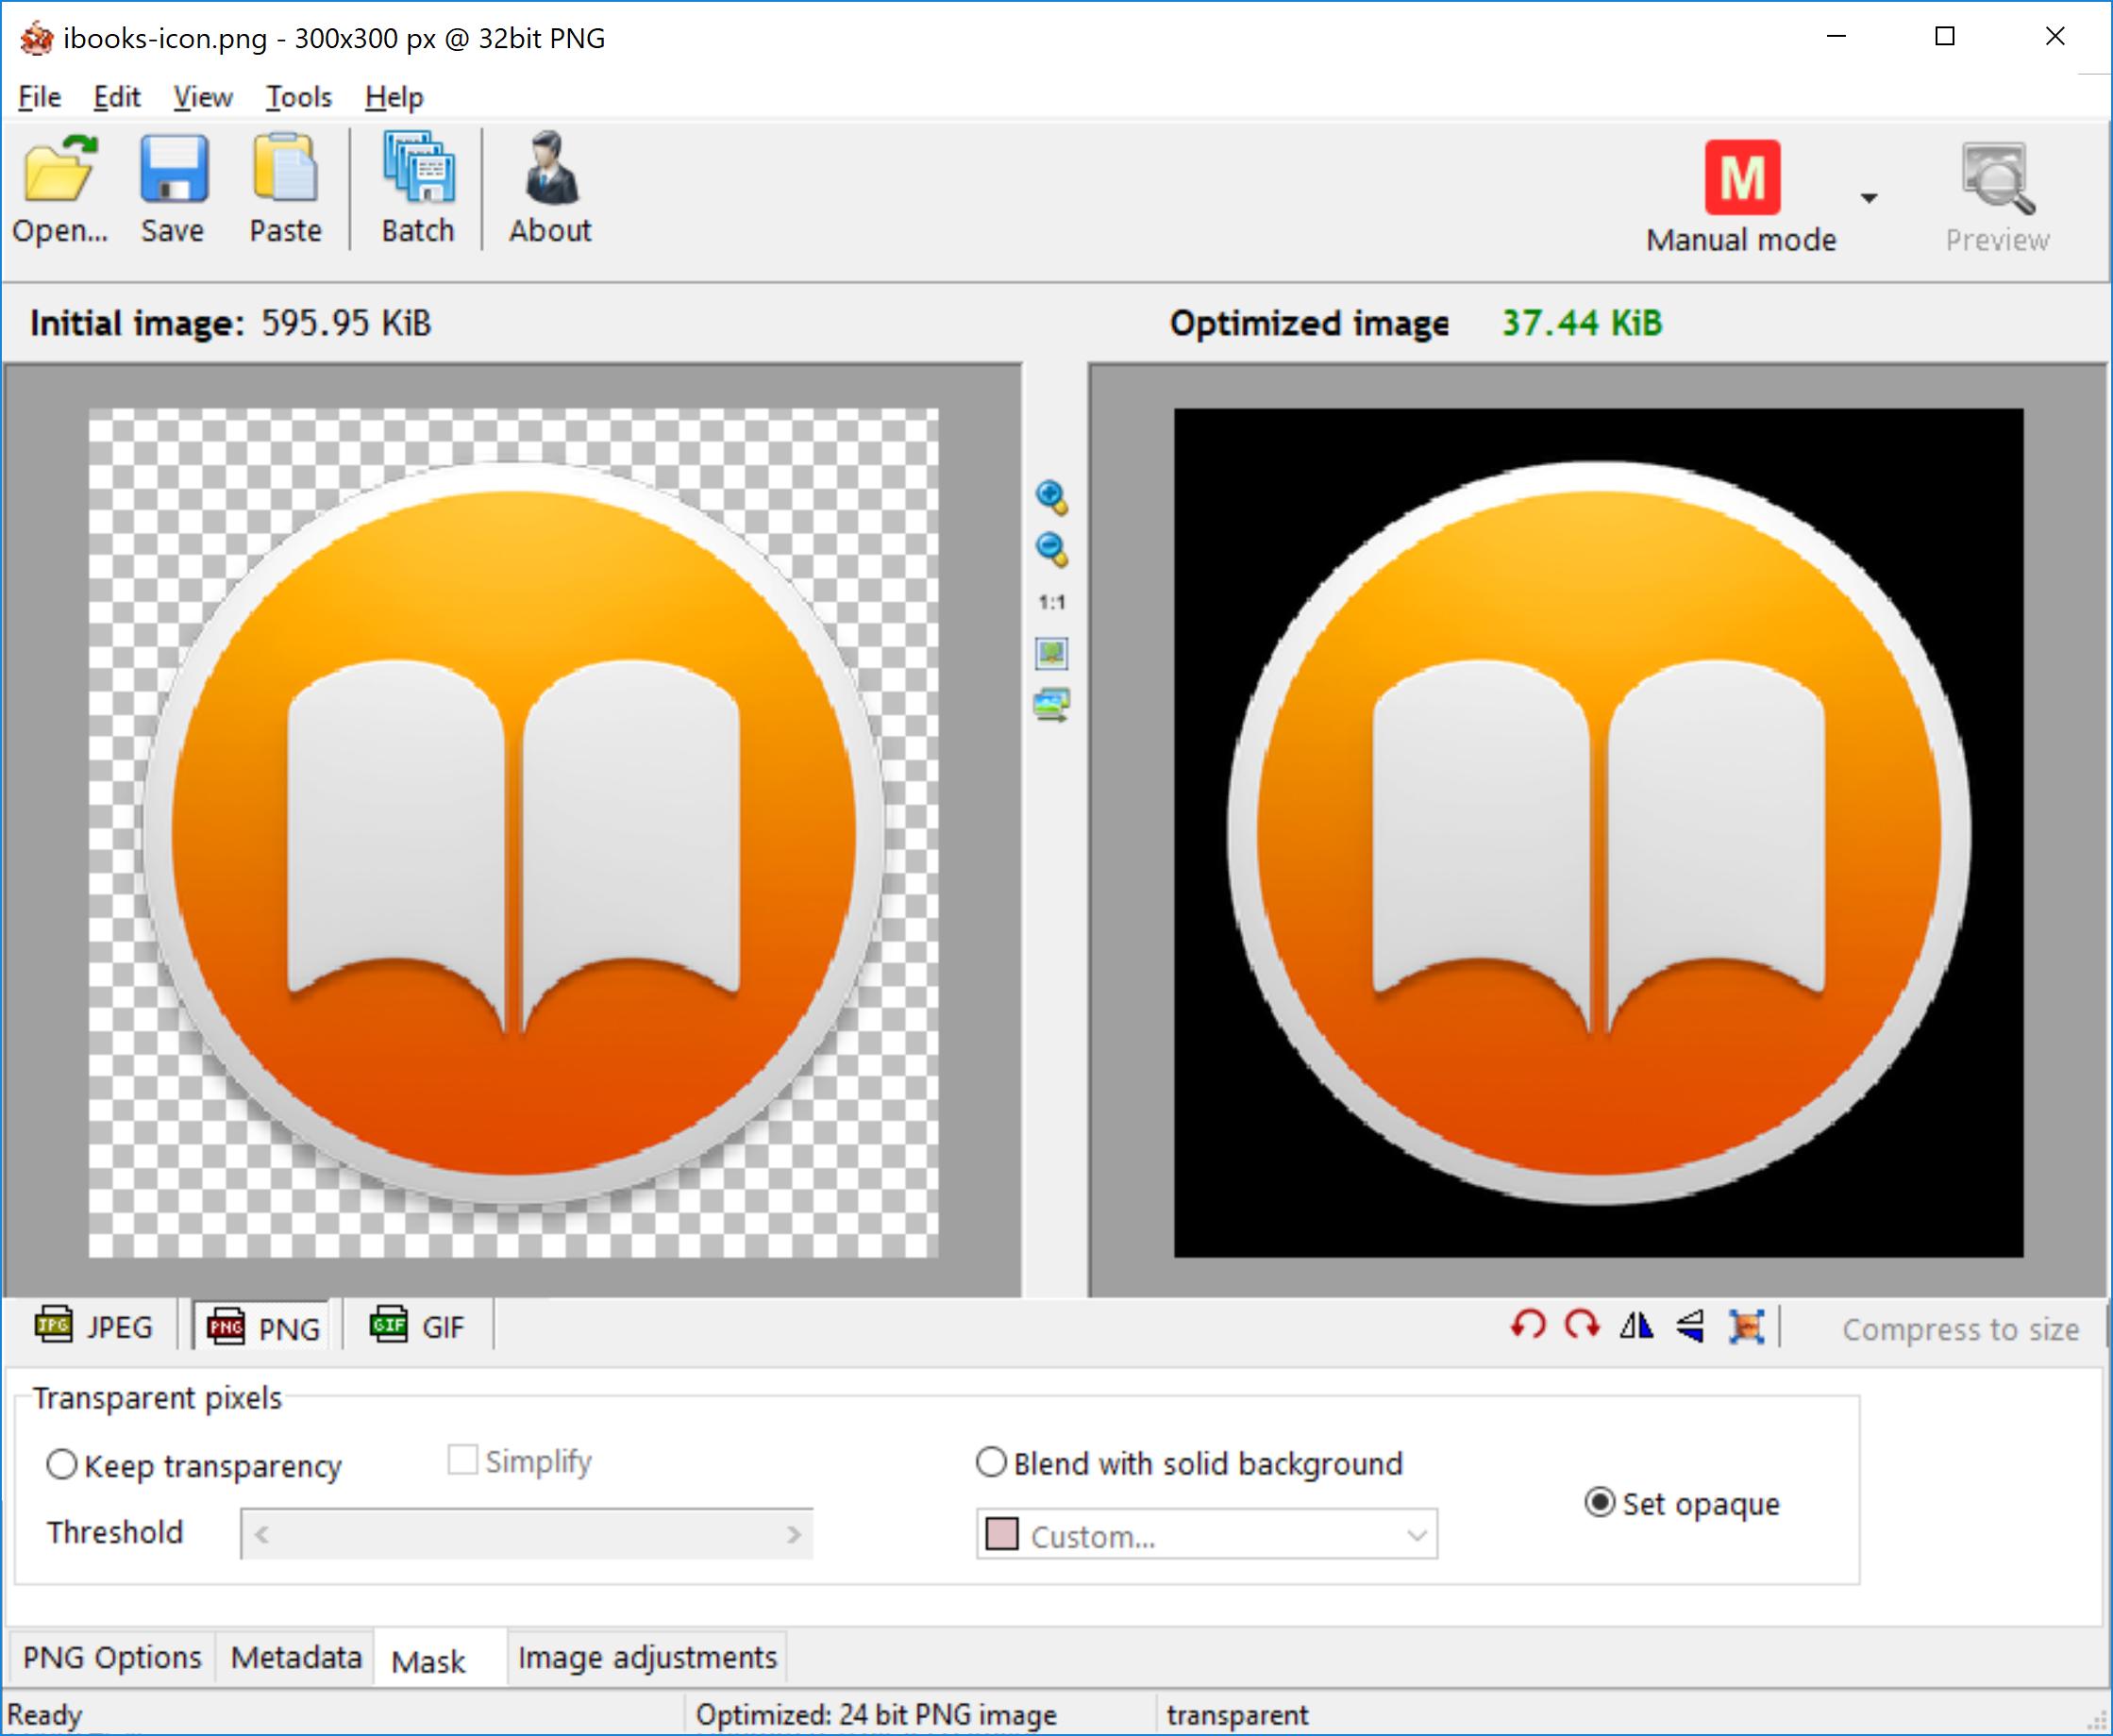 Screenshots | RIOT - Radical Image Optimization Tool